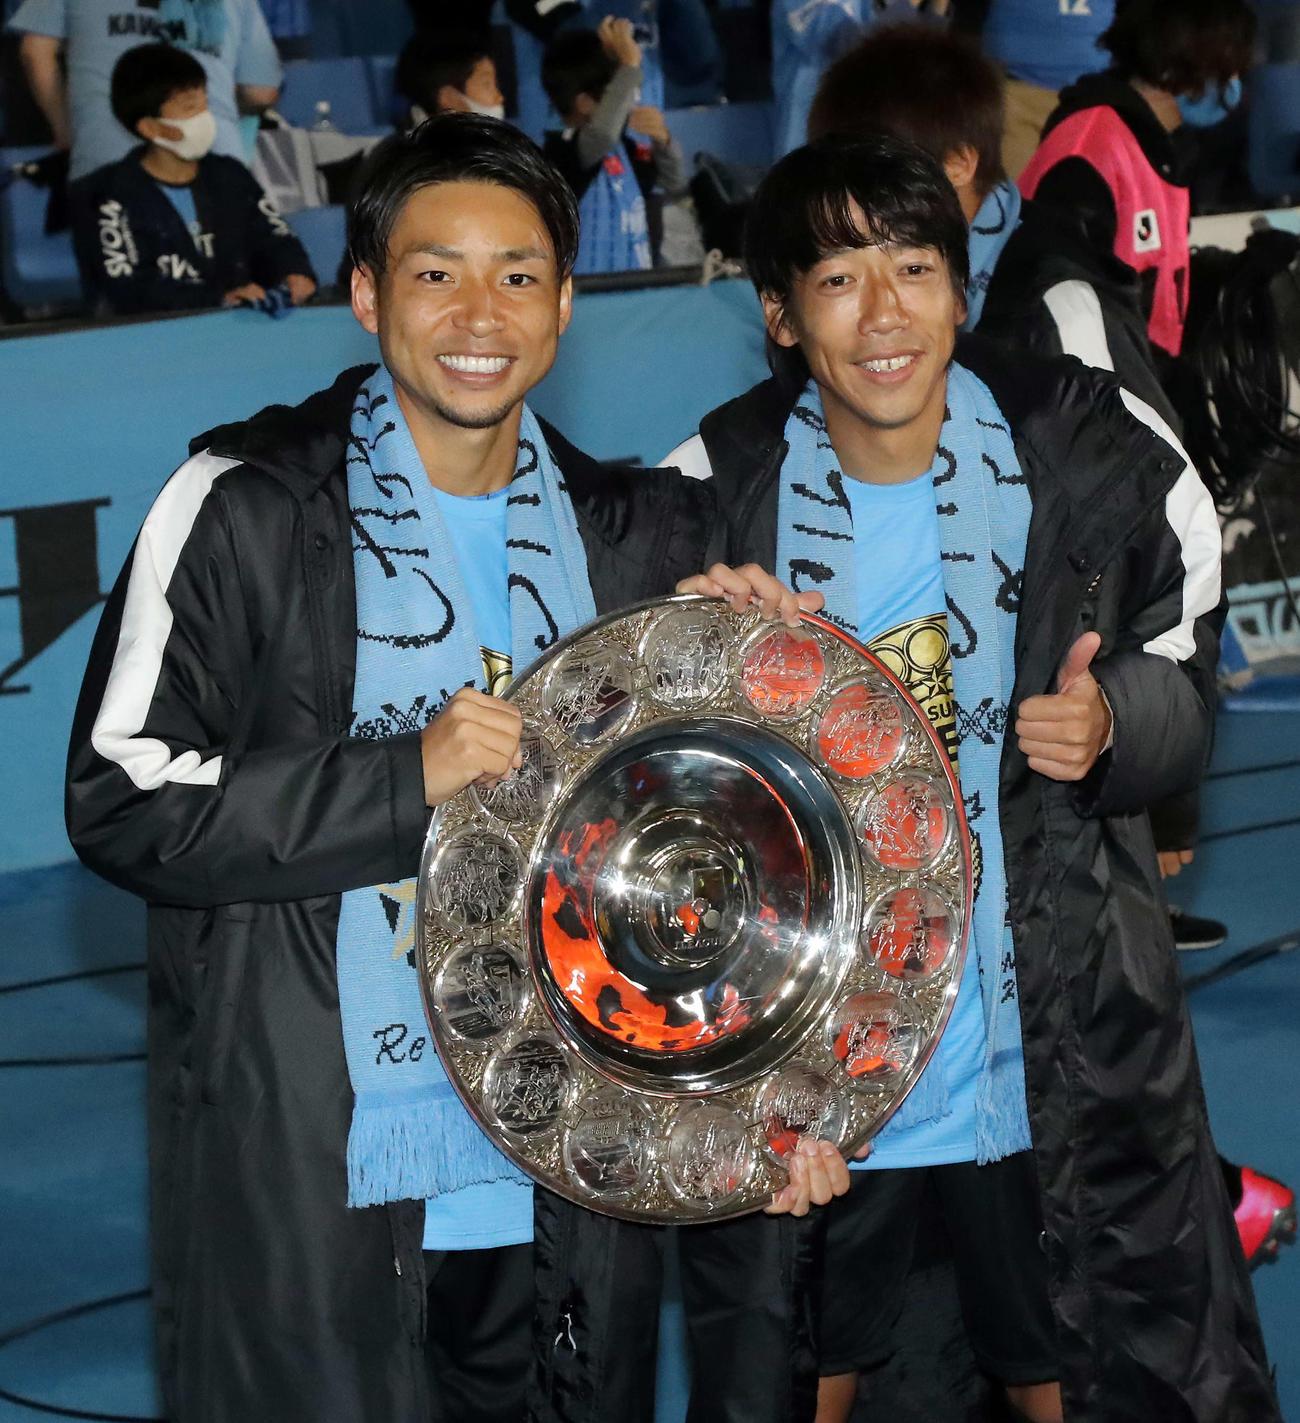 J1優勝シャーレを手に笑顔を見せる川崎F・MF中村憲剛(右)とFW小林悠(2020年11月25日撮影)